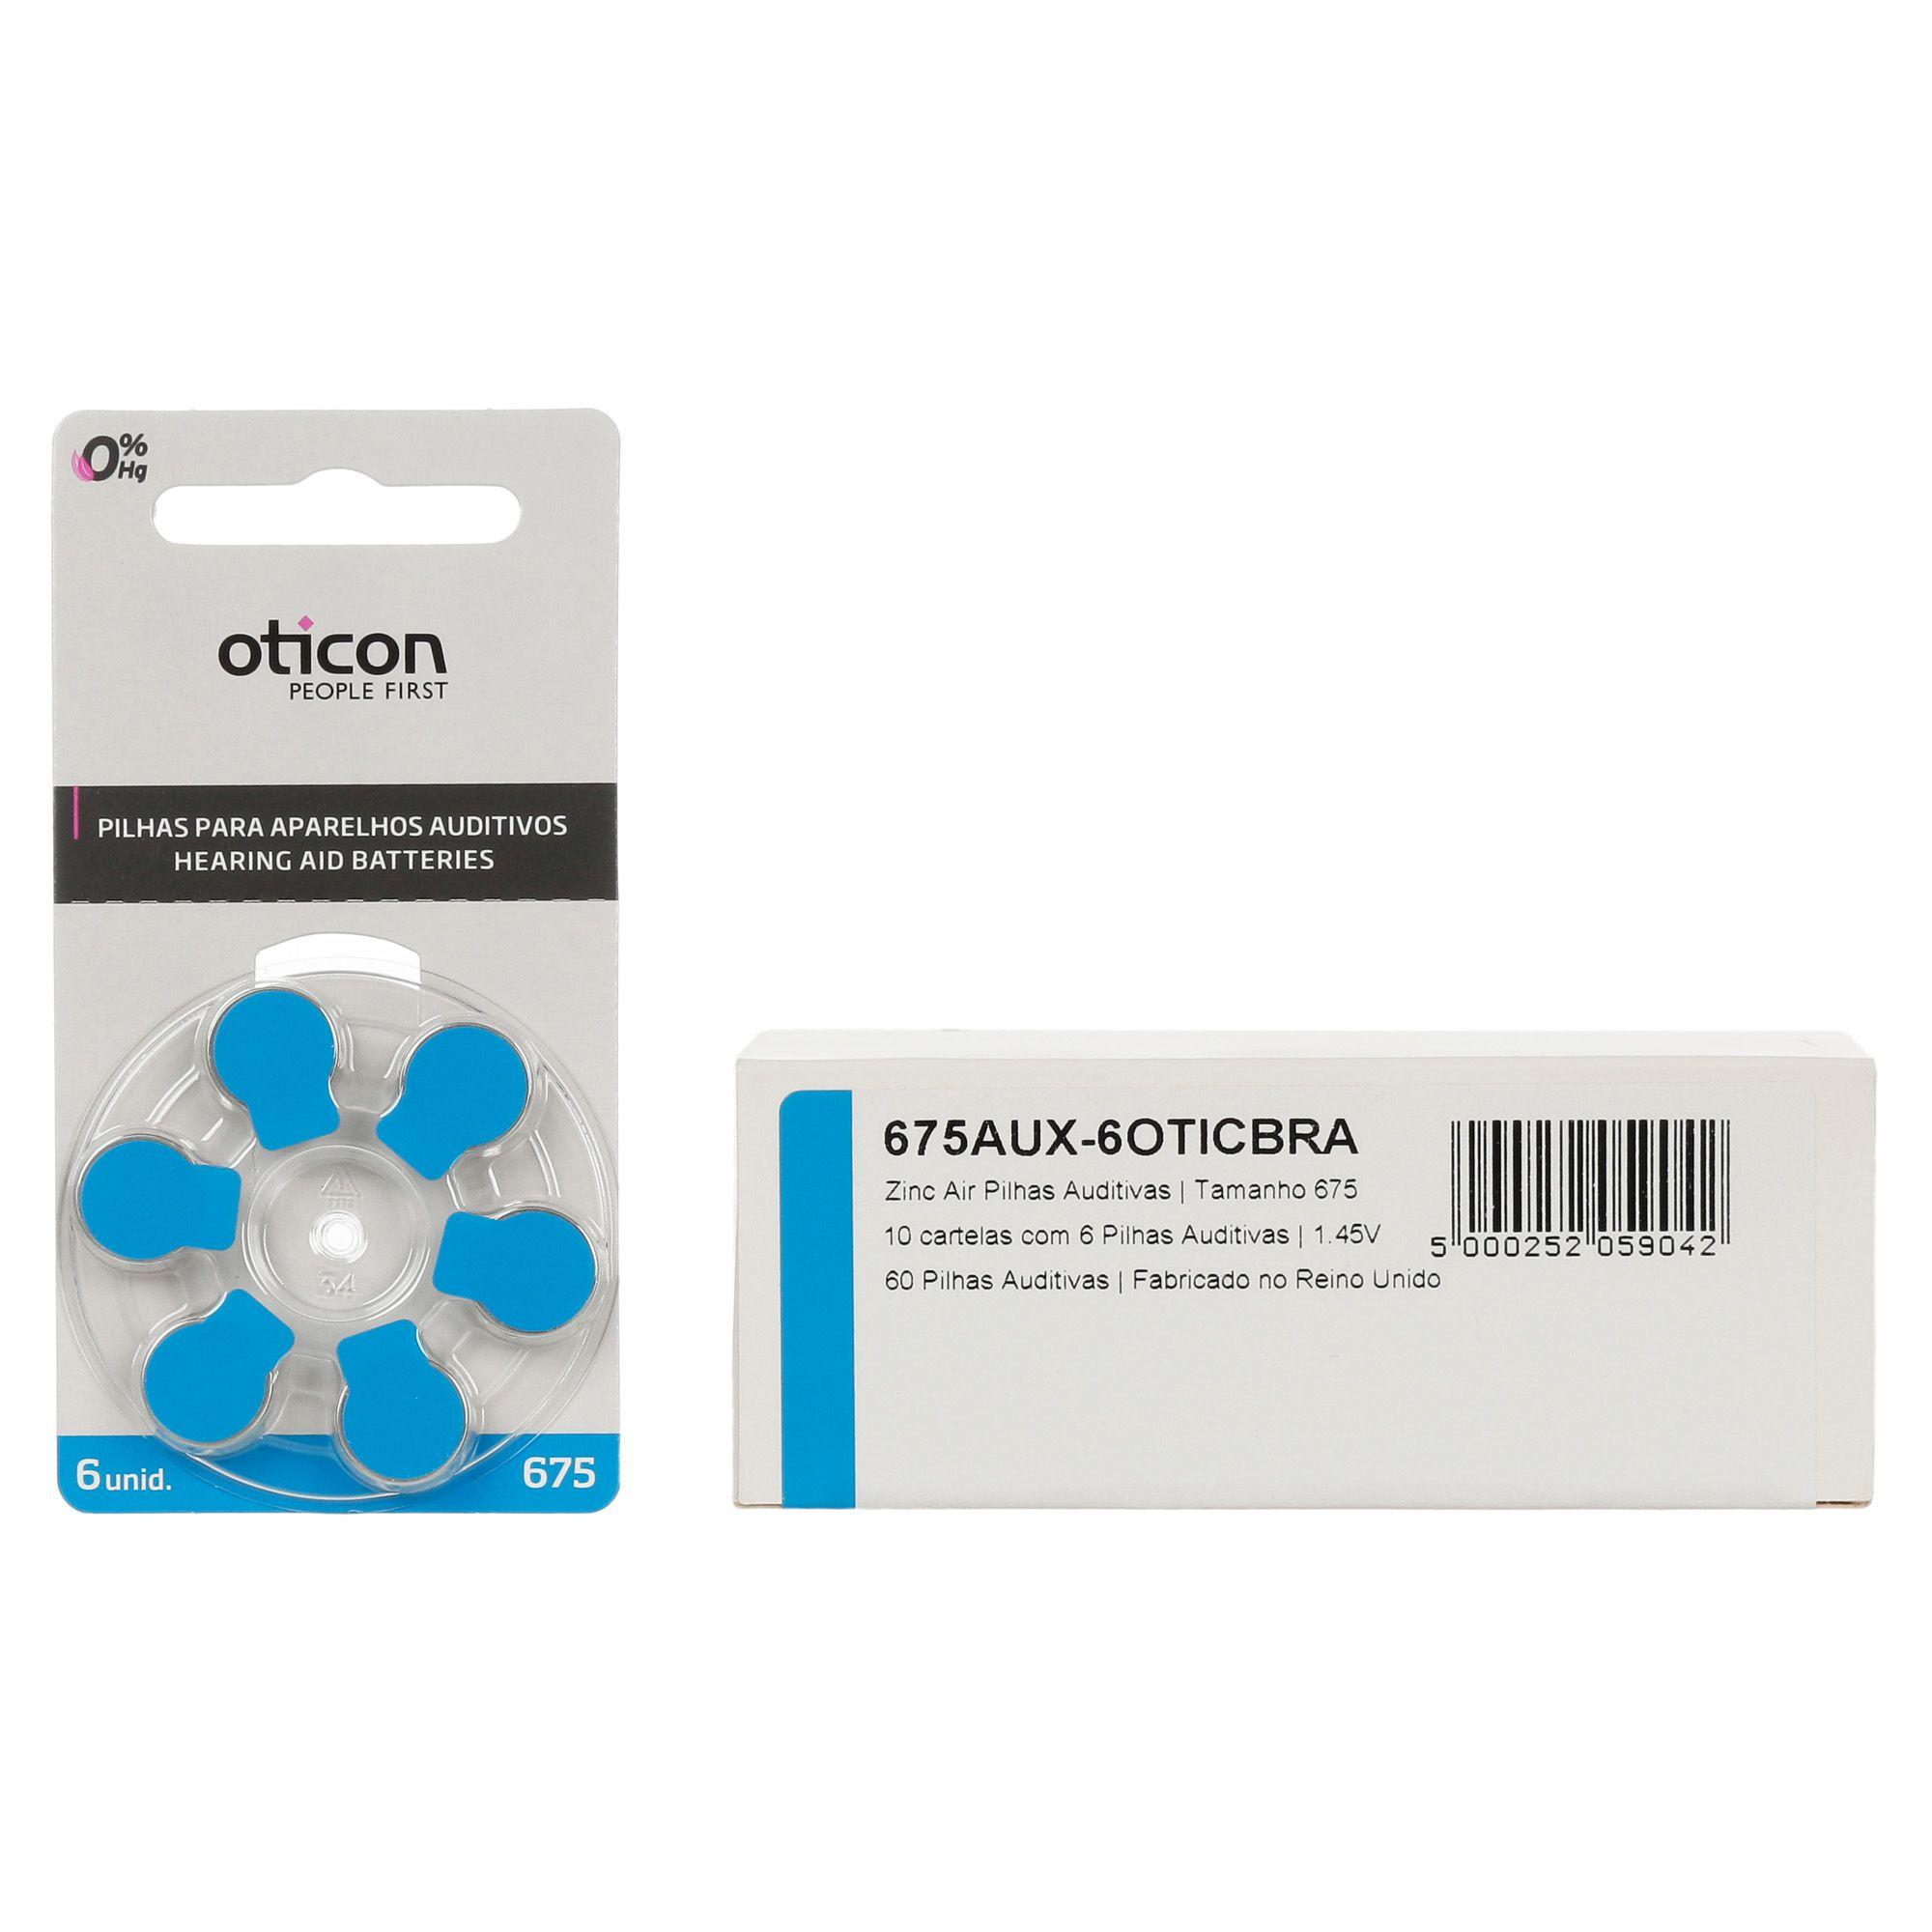 OTICON 675 / PR44 - 10 Cartelas - 60 Baterias para Aparelho Auditivo